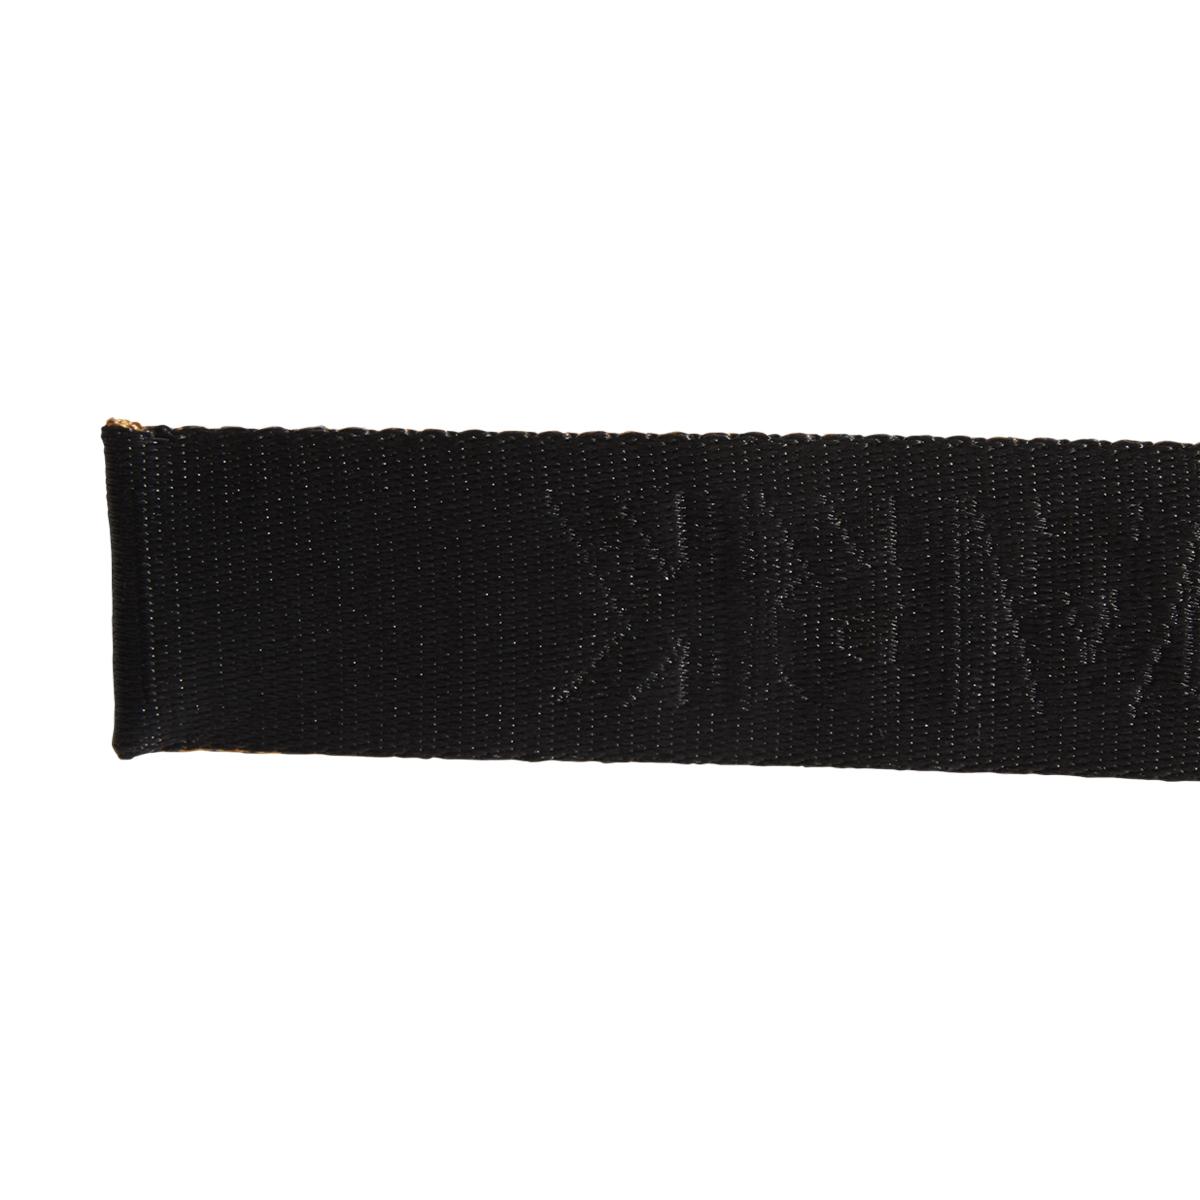 adidas IVY PARK Logo Belt